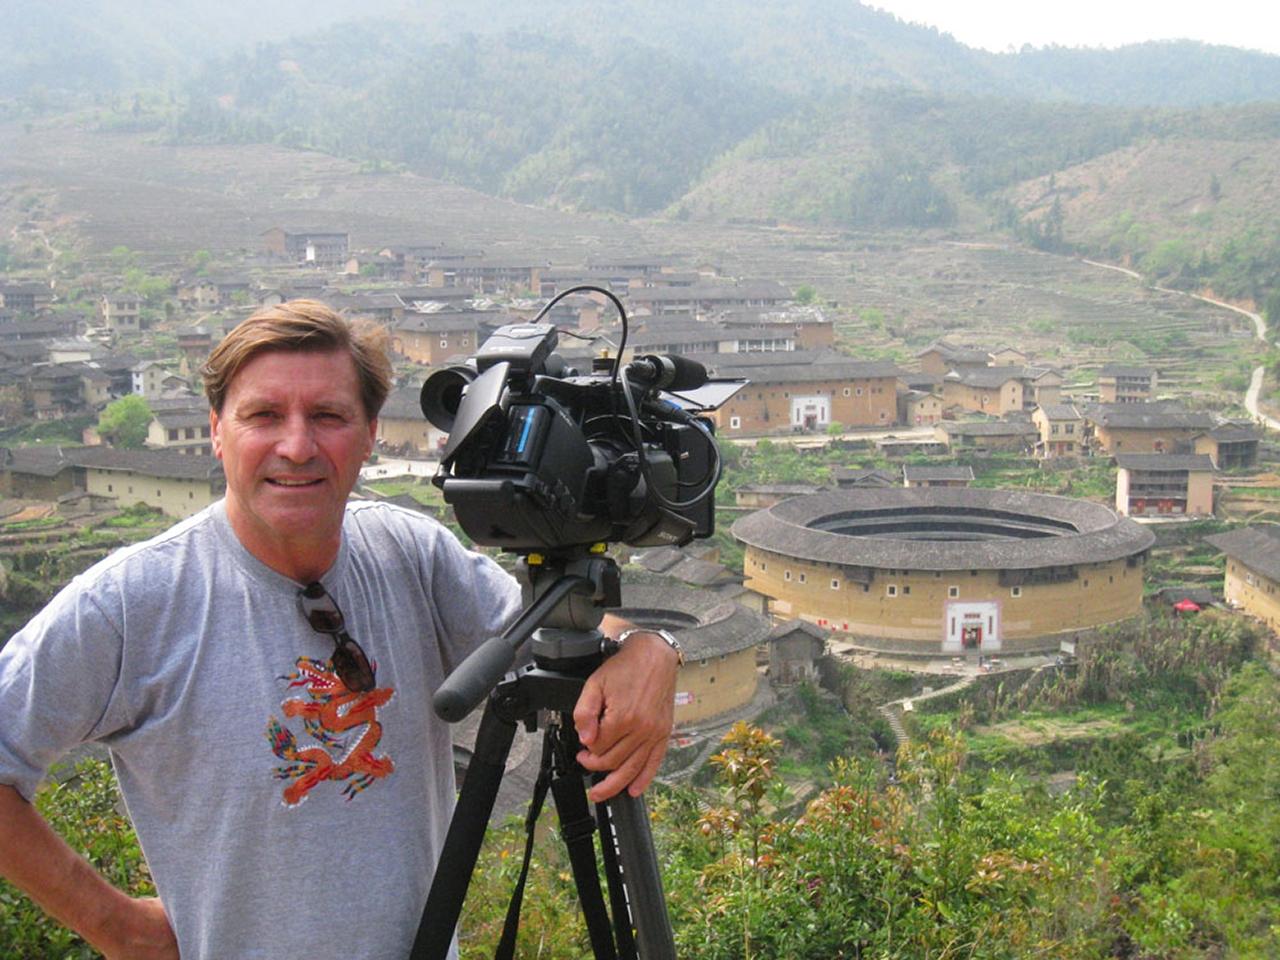 Jon Braeley filming at Jiqing Tulou, Fujian, China. 2009